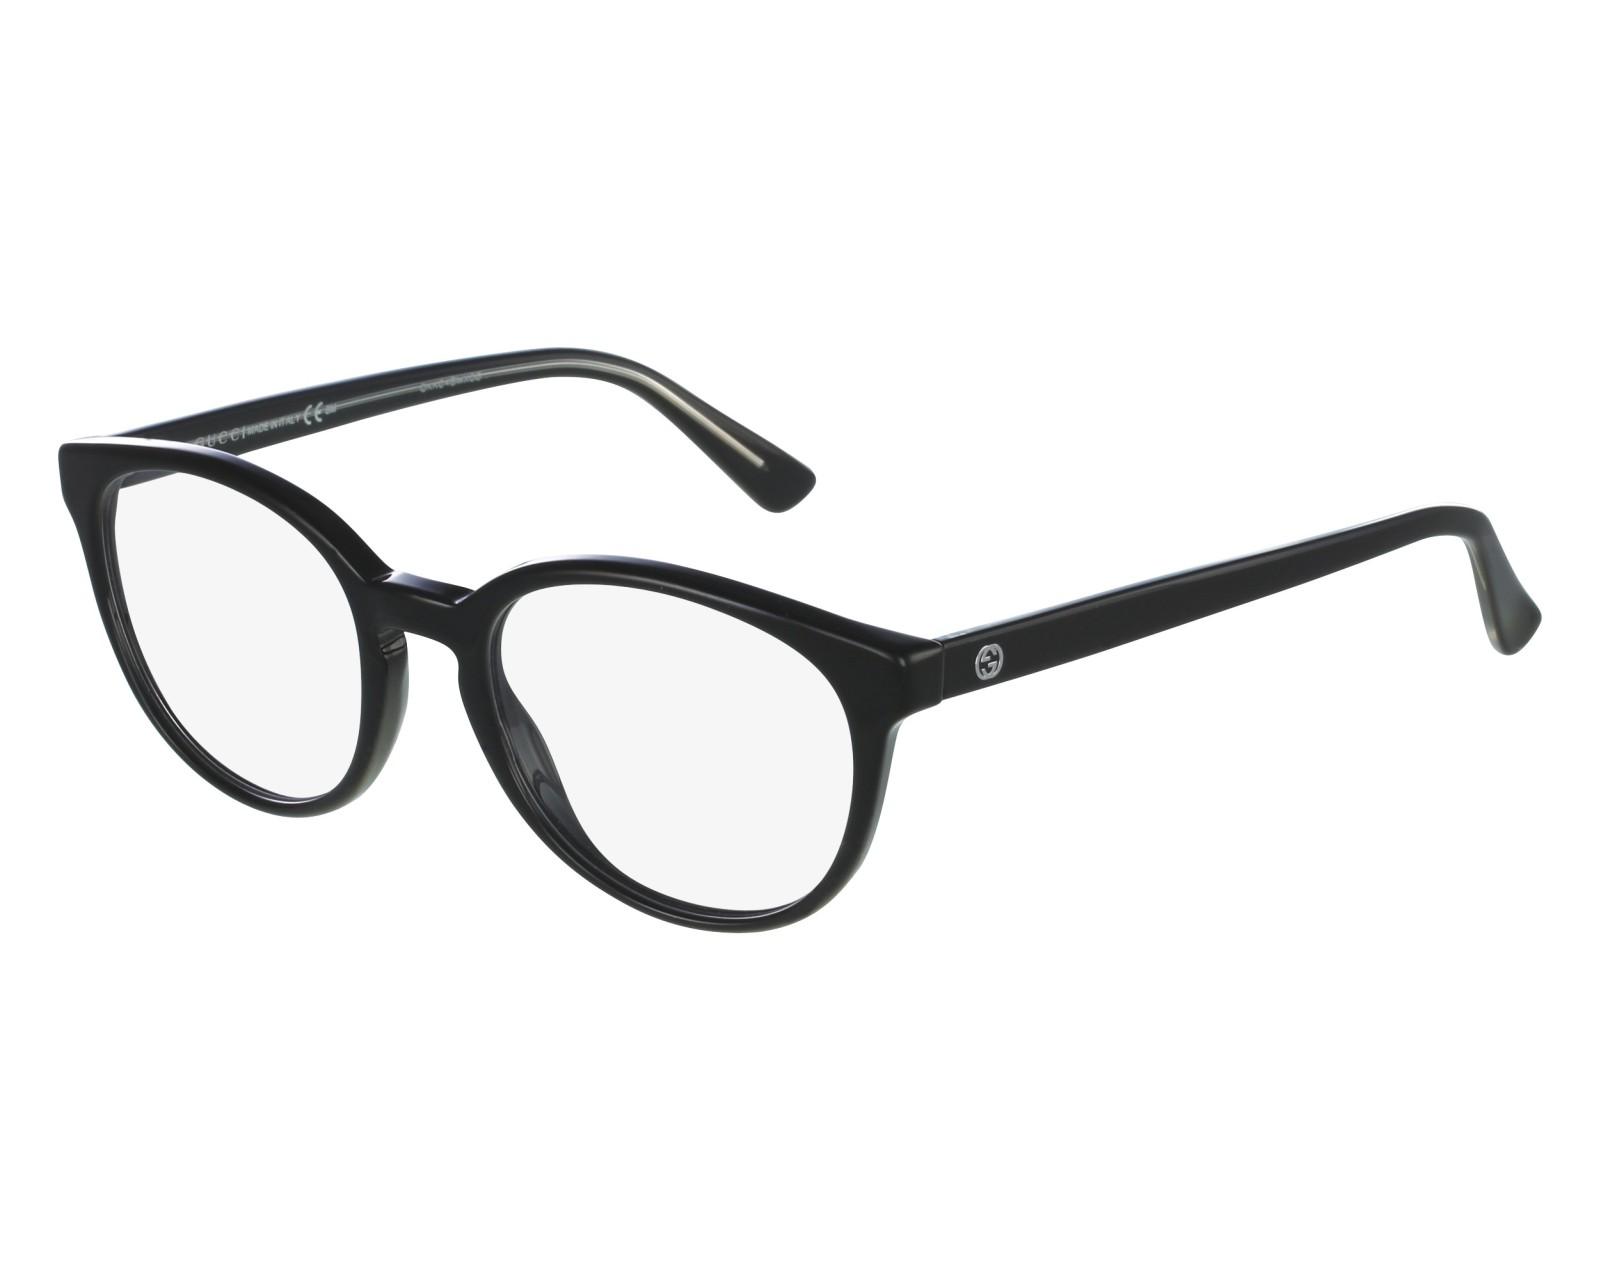 achat lunettes de vue gucci gg 3753 y6c visionet. Black Bedroom Furniture Sets. Home Design Ideas